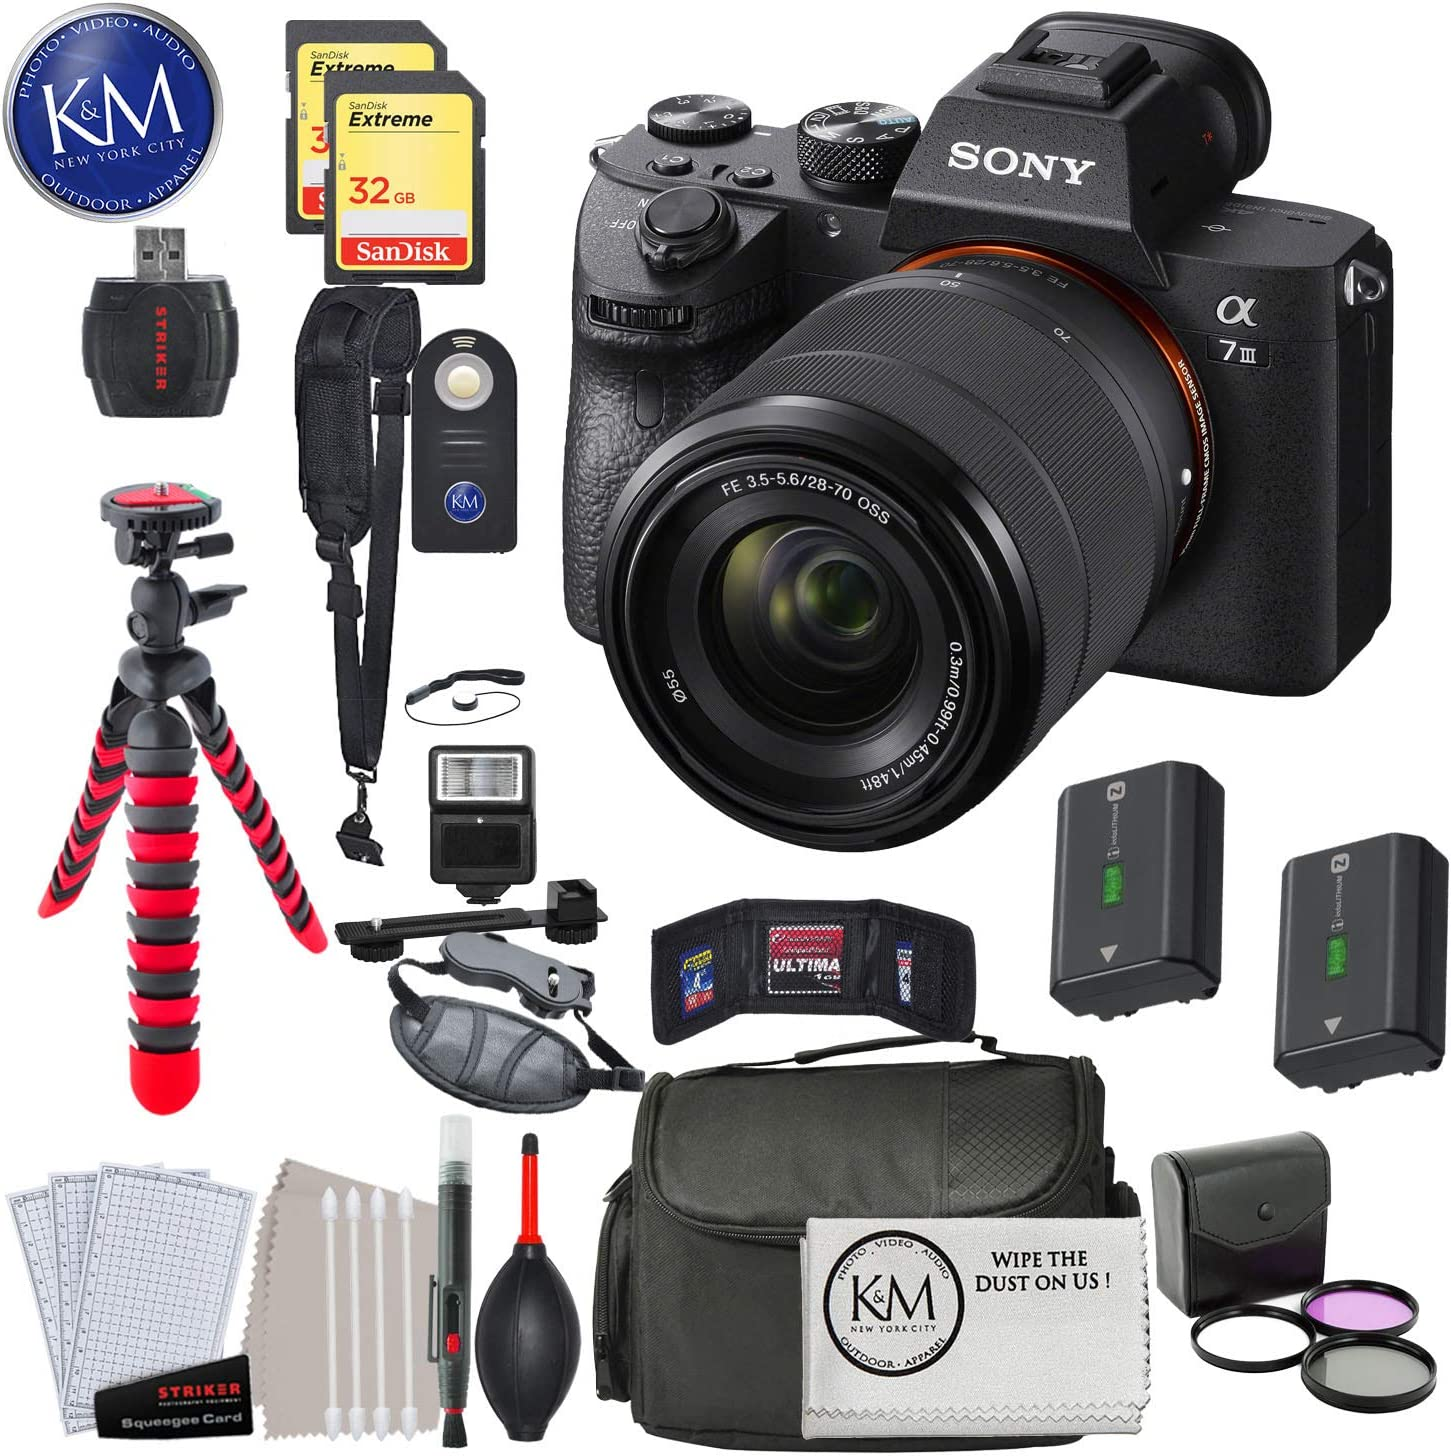 Sony Alpha a7 III Mirrorless Digital Camera Body w//Audio Technica Microphone /& Tripod Deluxe Bundle